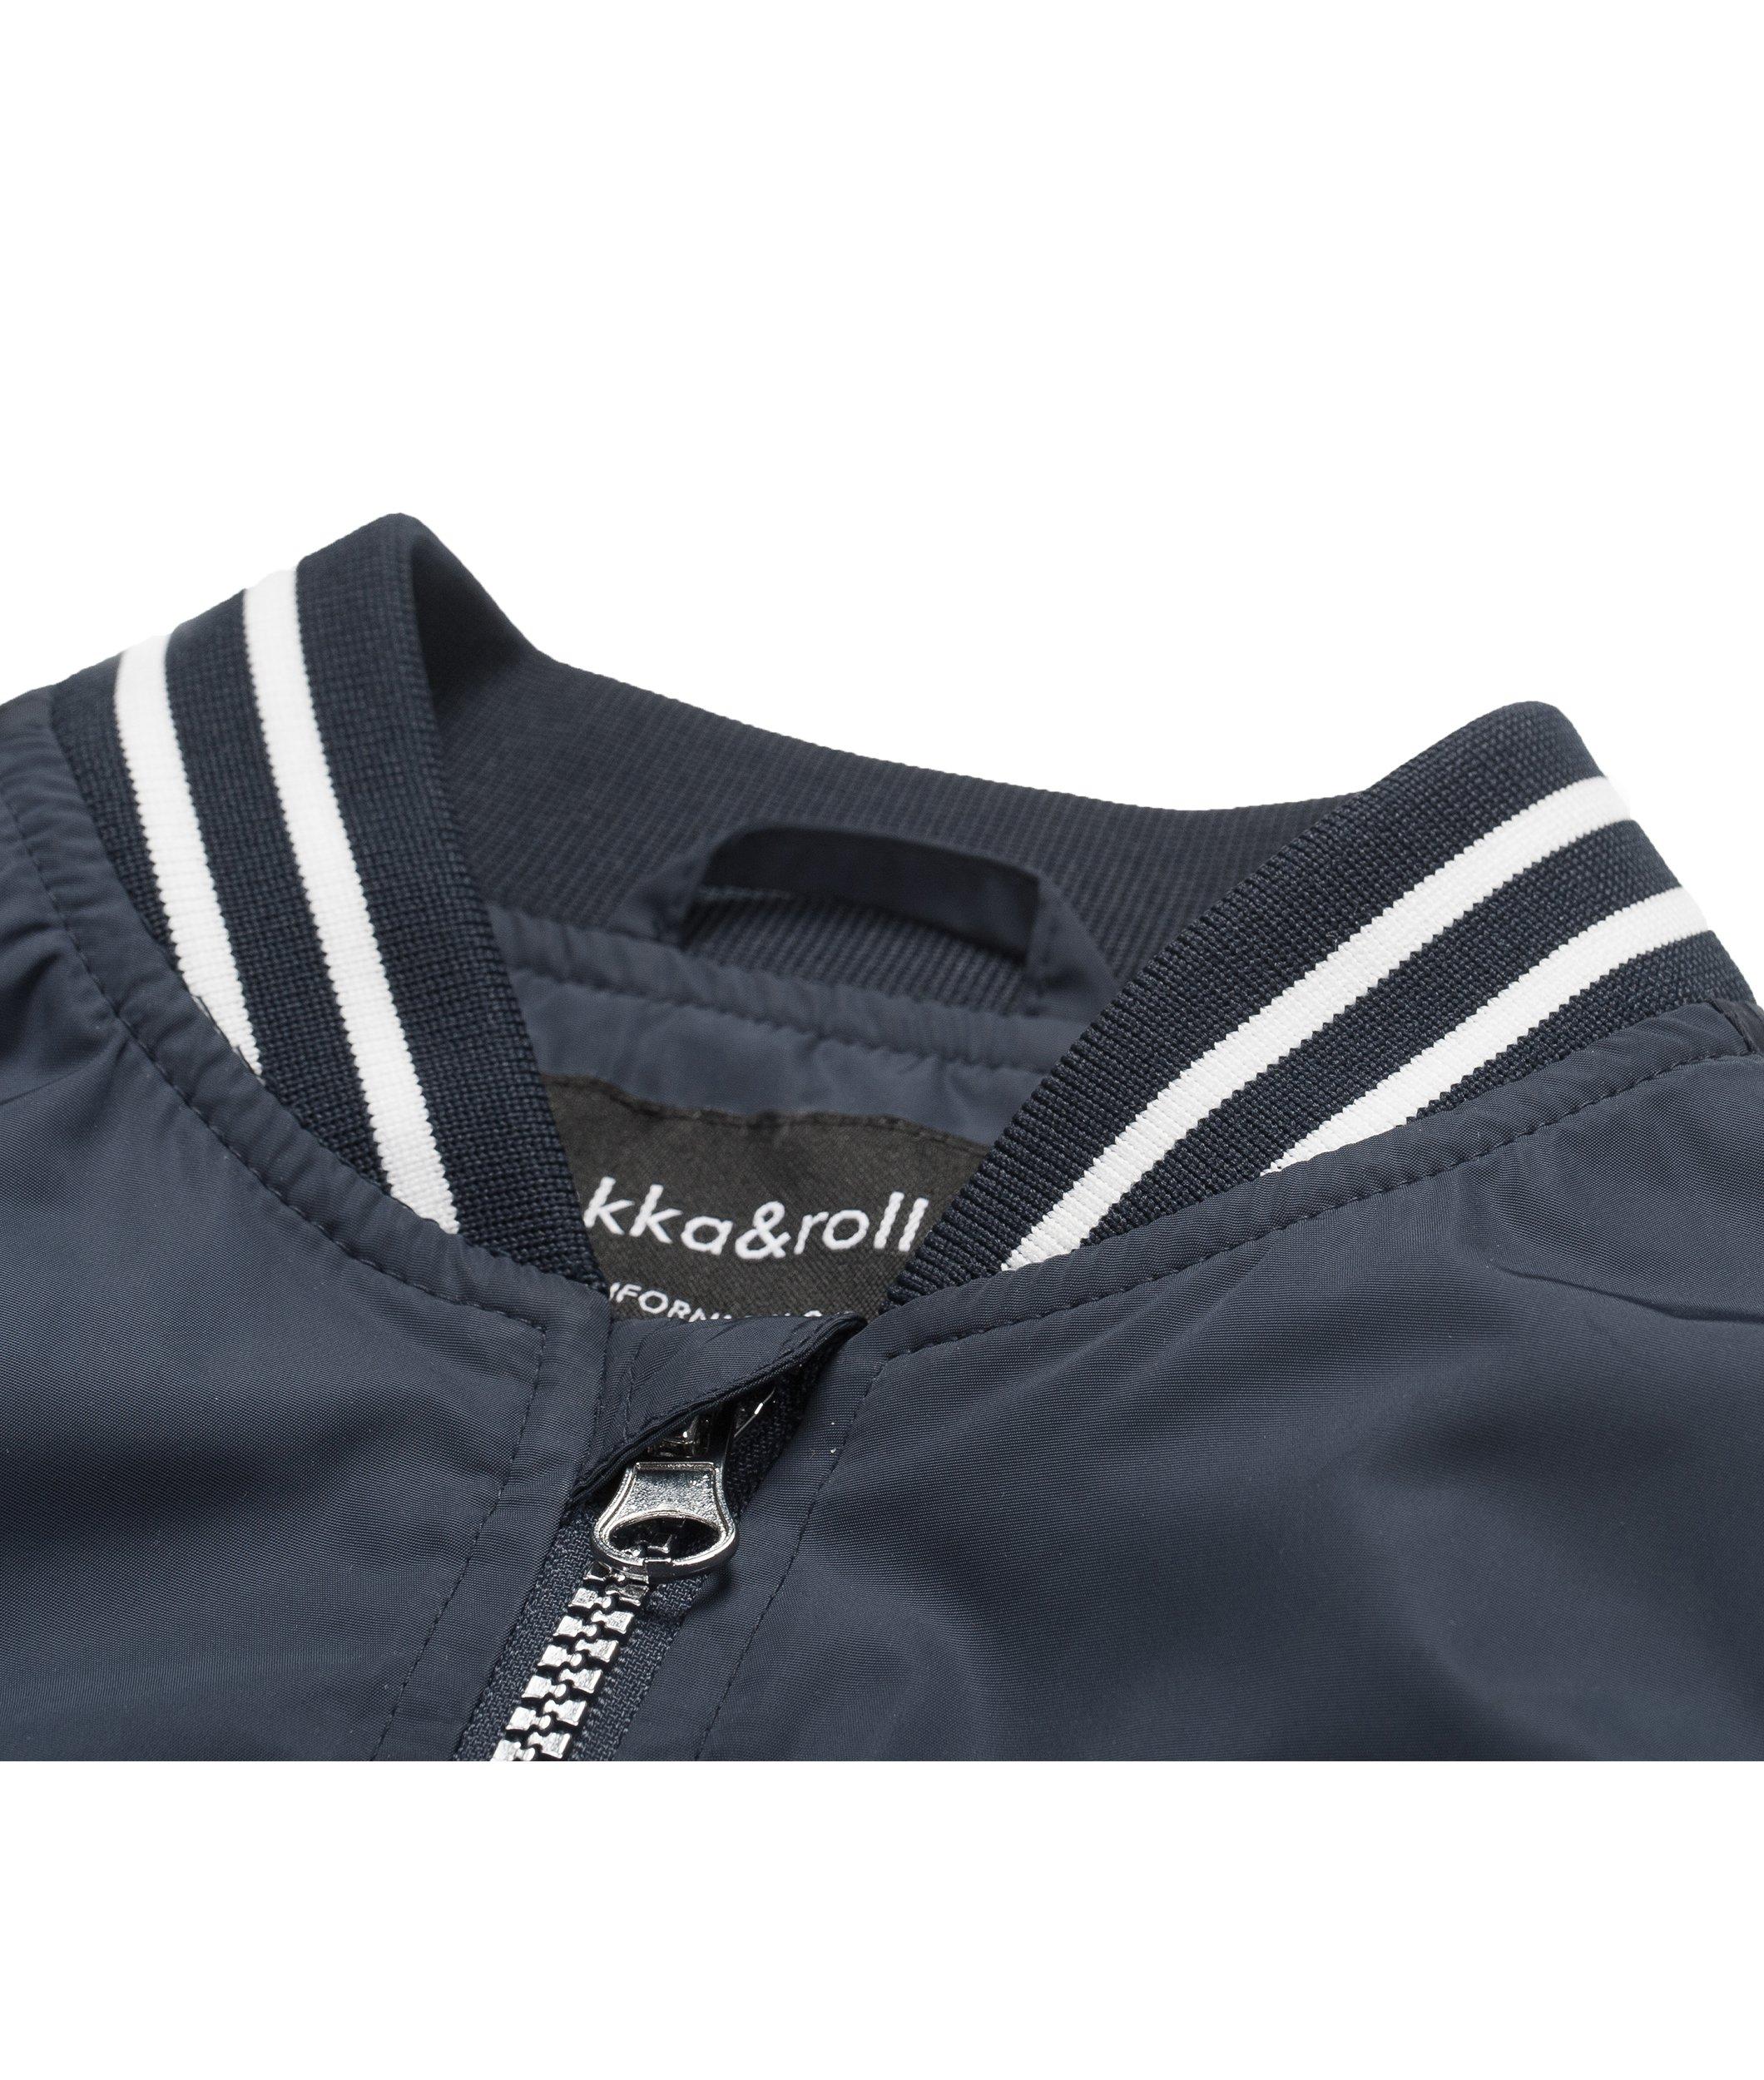 Rokka&Rolla Boys' Zip Up Lightweight Casual Fashion Wind Flight Bomber Jacket by Rokka&Rolla (Image #4)